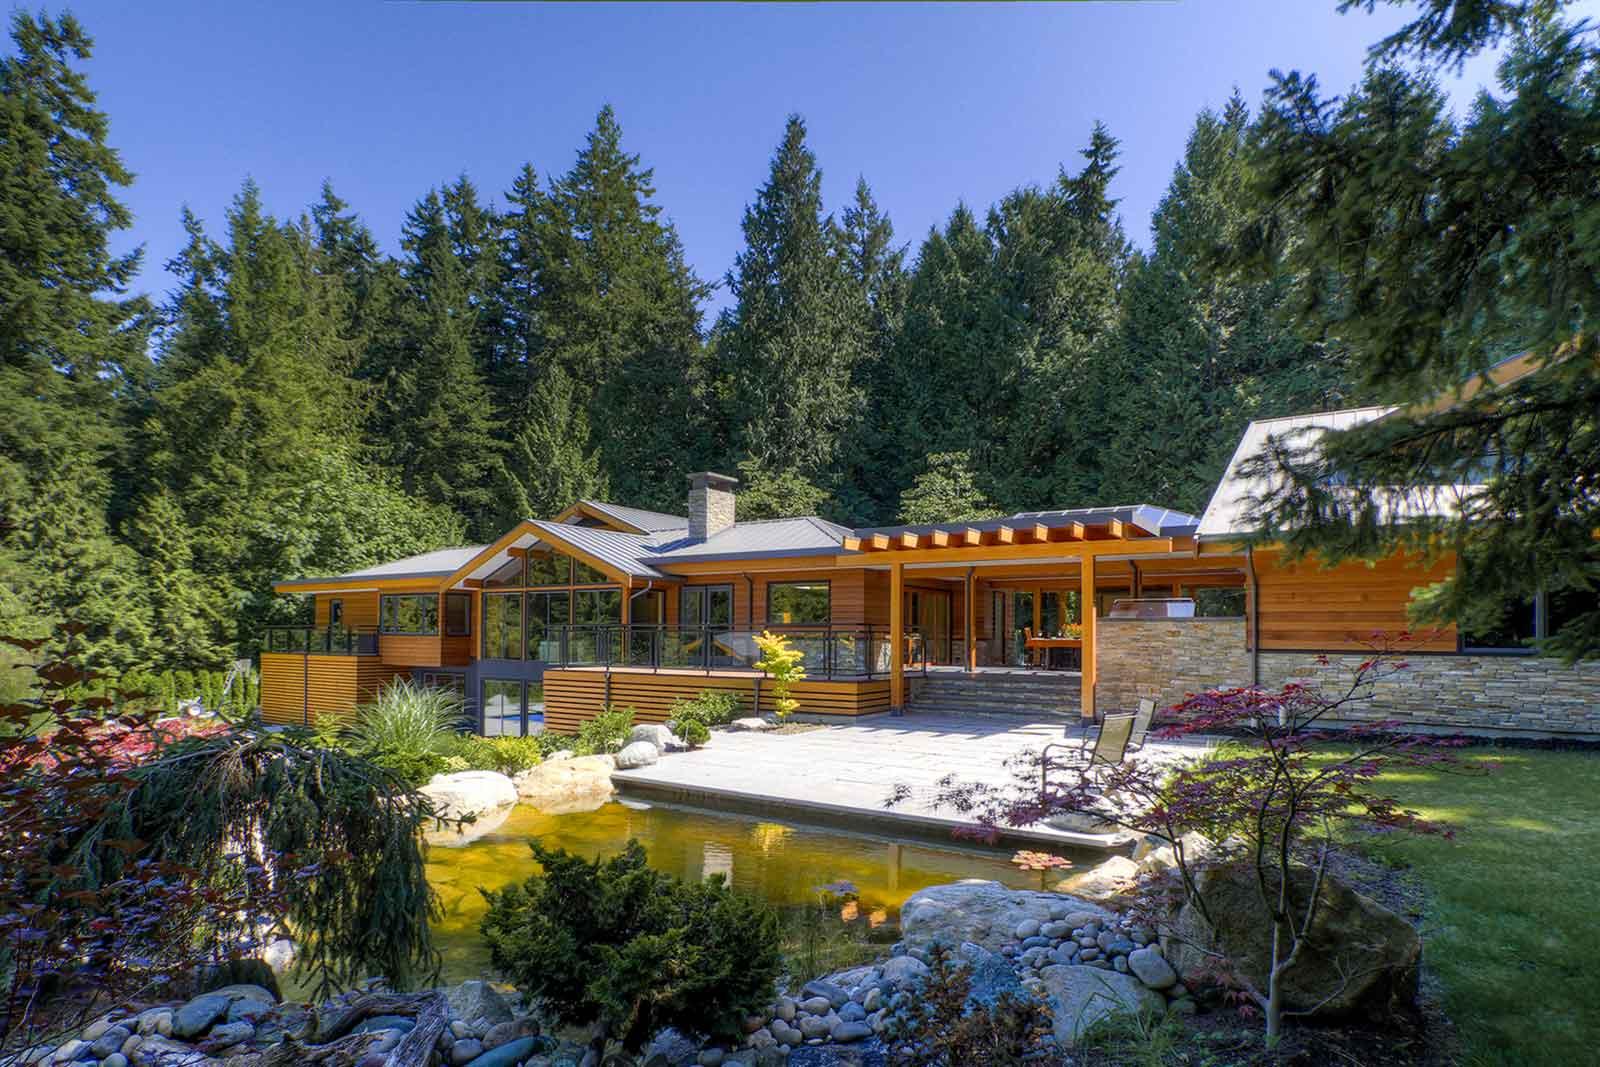 Custom designed and renovated backyard